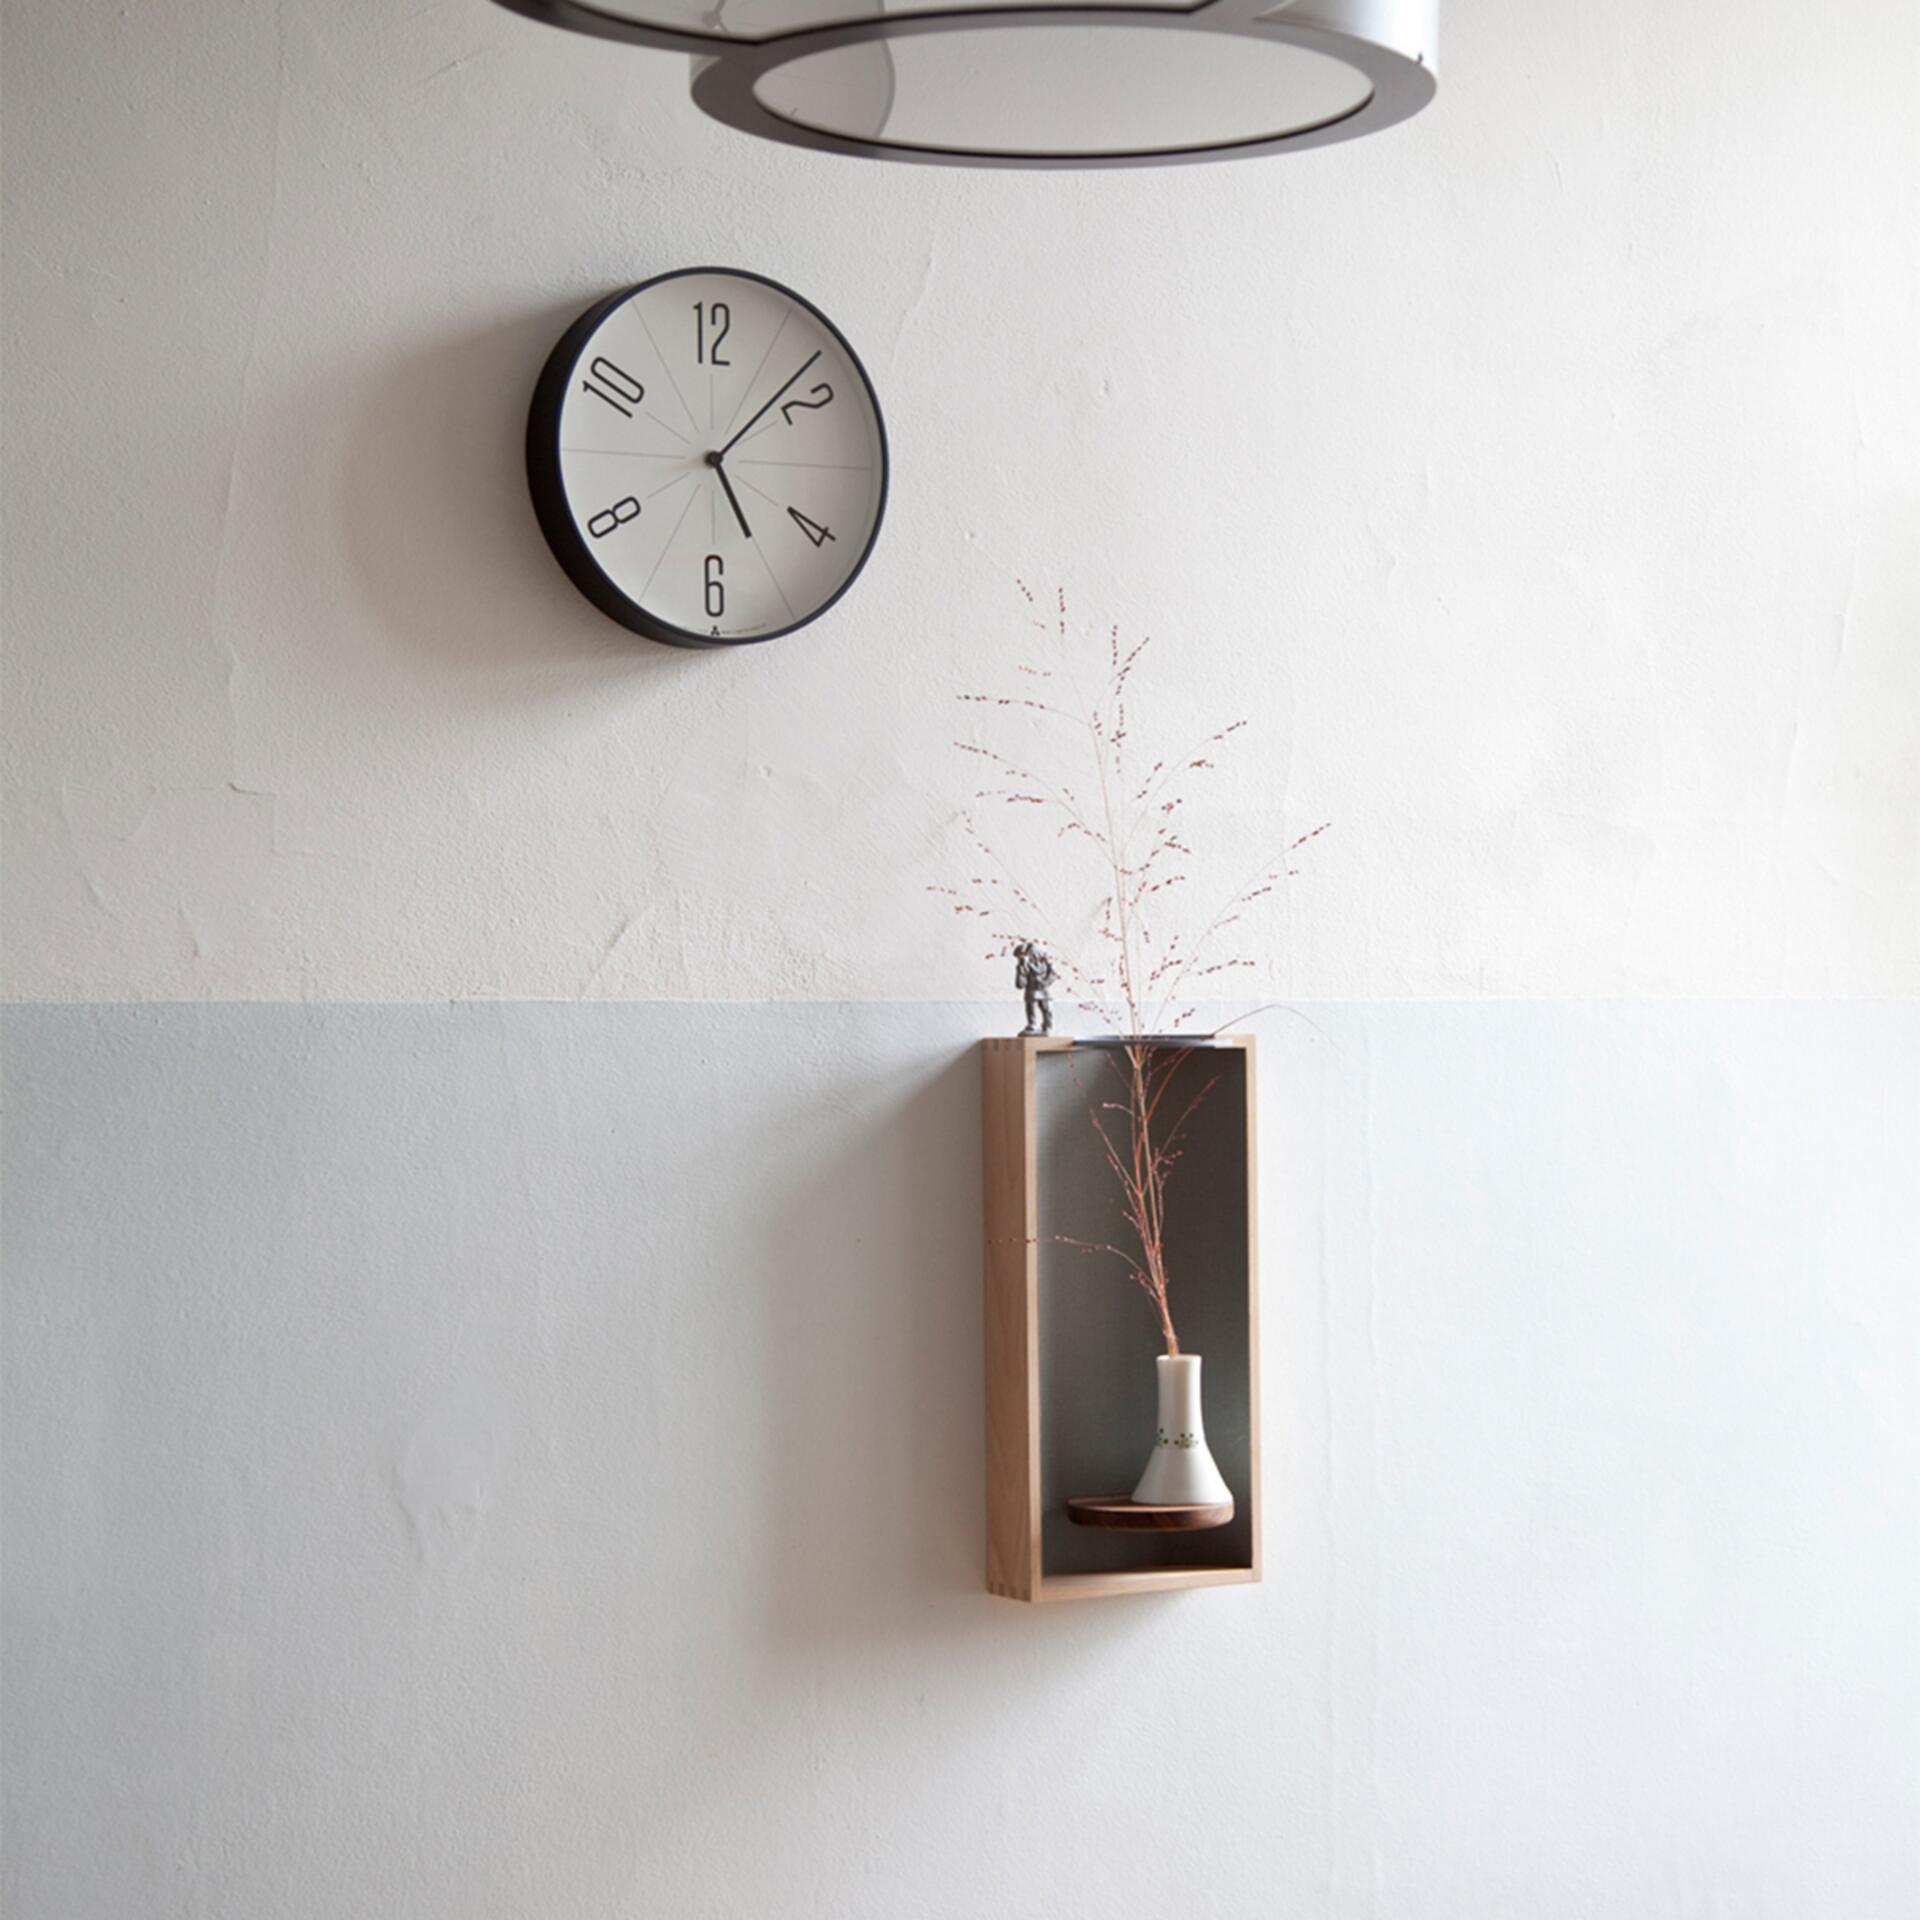 Lemnos Awa Clock Gugu Wanduhr Weiss mit schwarzem Rahmen